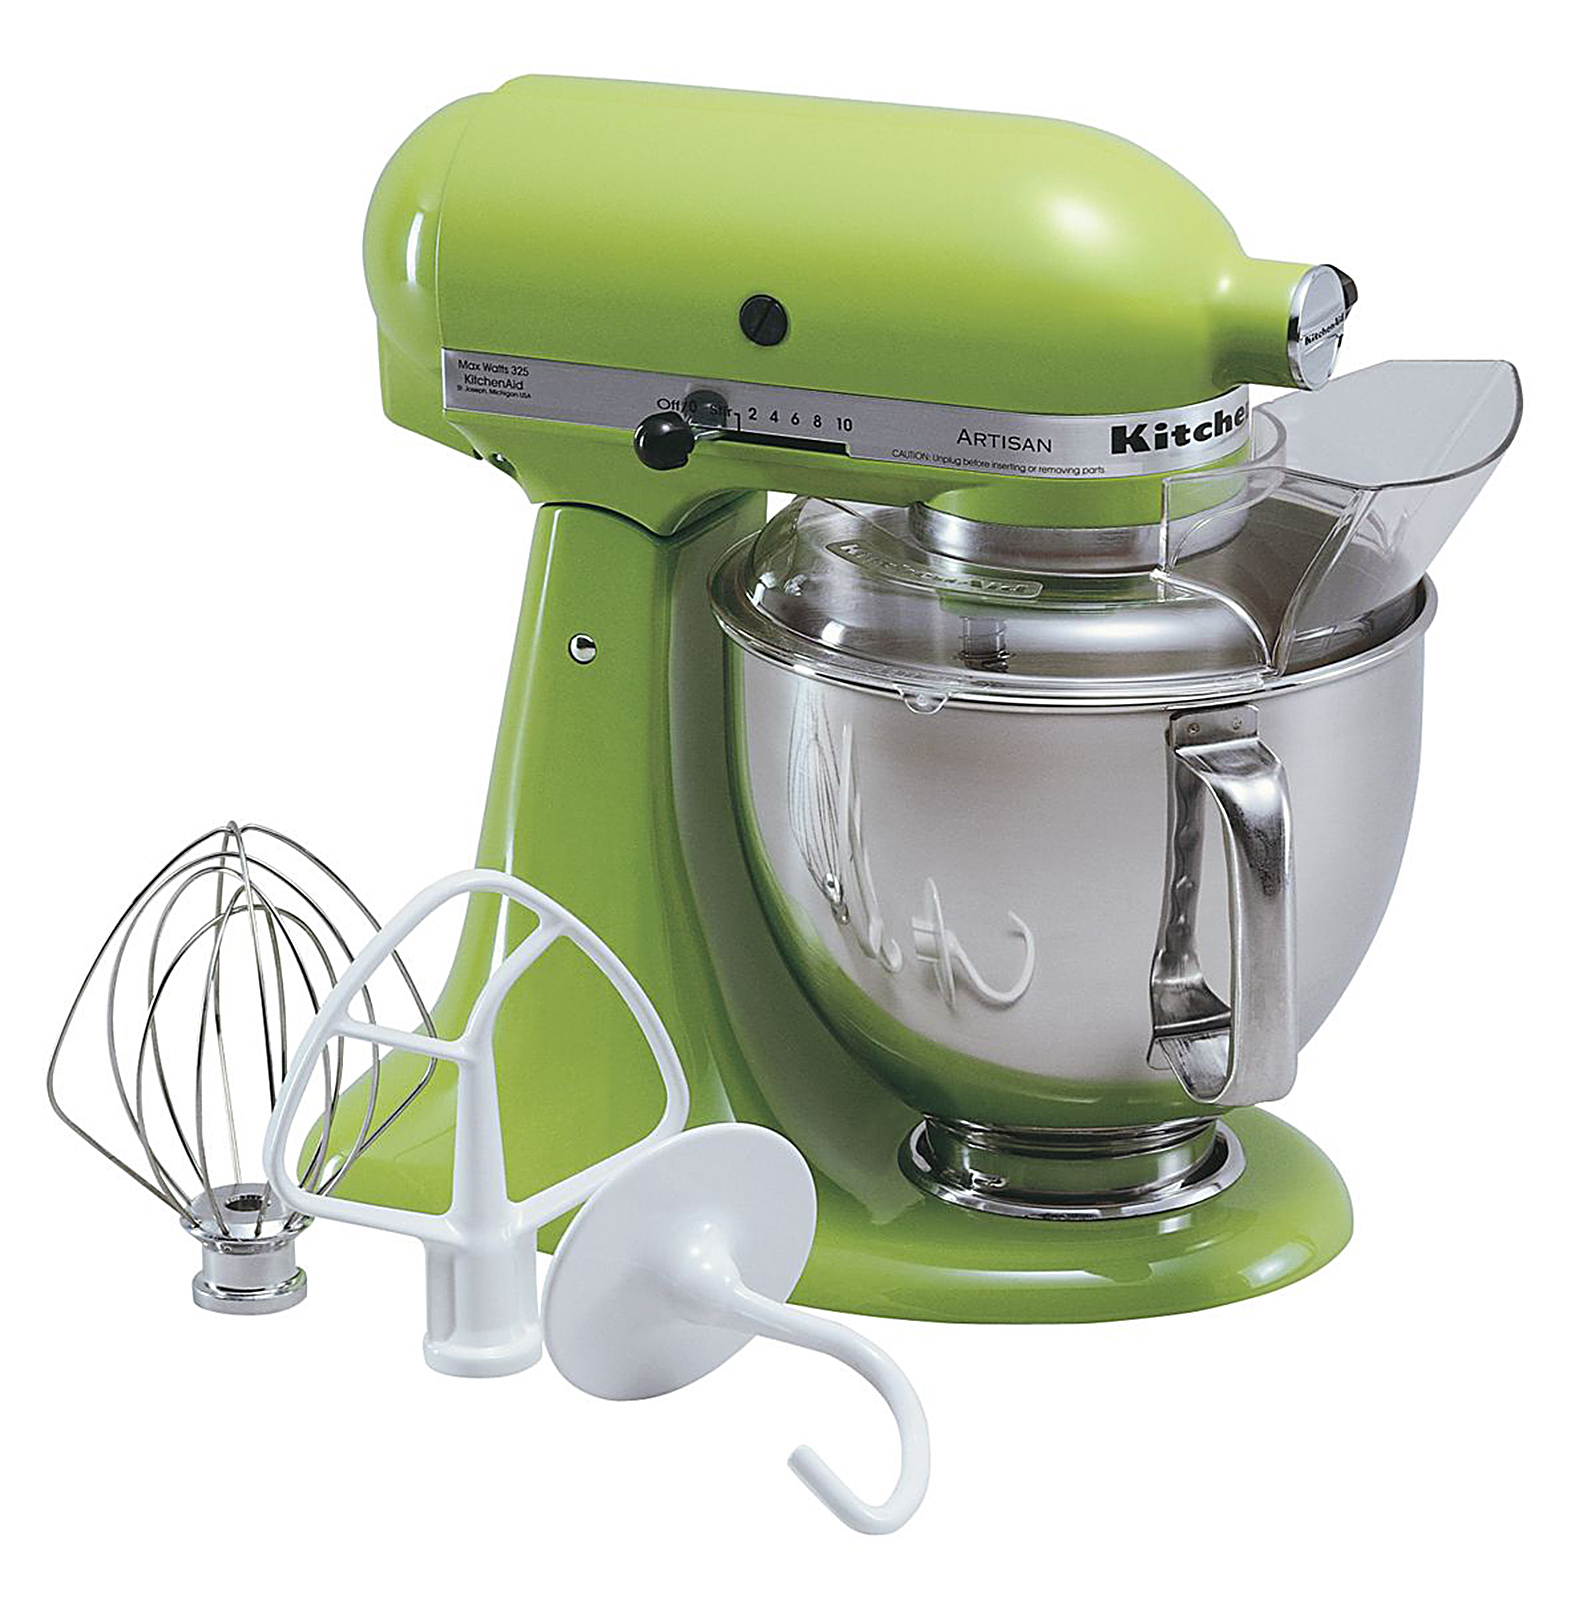 kitchen aid standing mixer moen faucets kitchenaid ksm150psga artisan series green apple 5